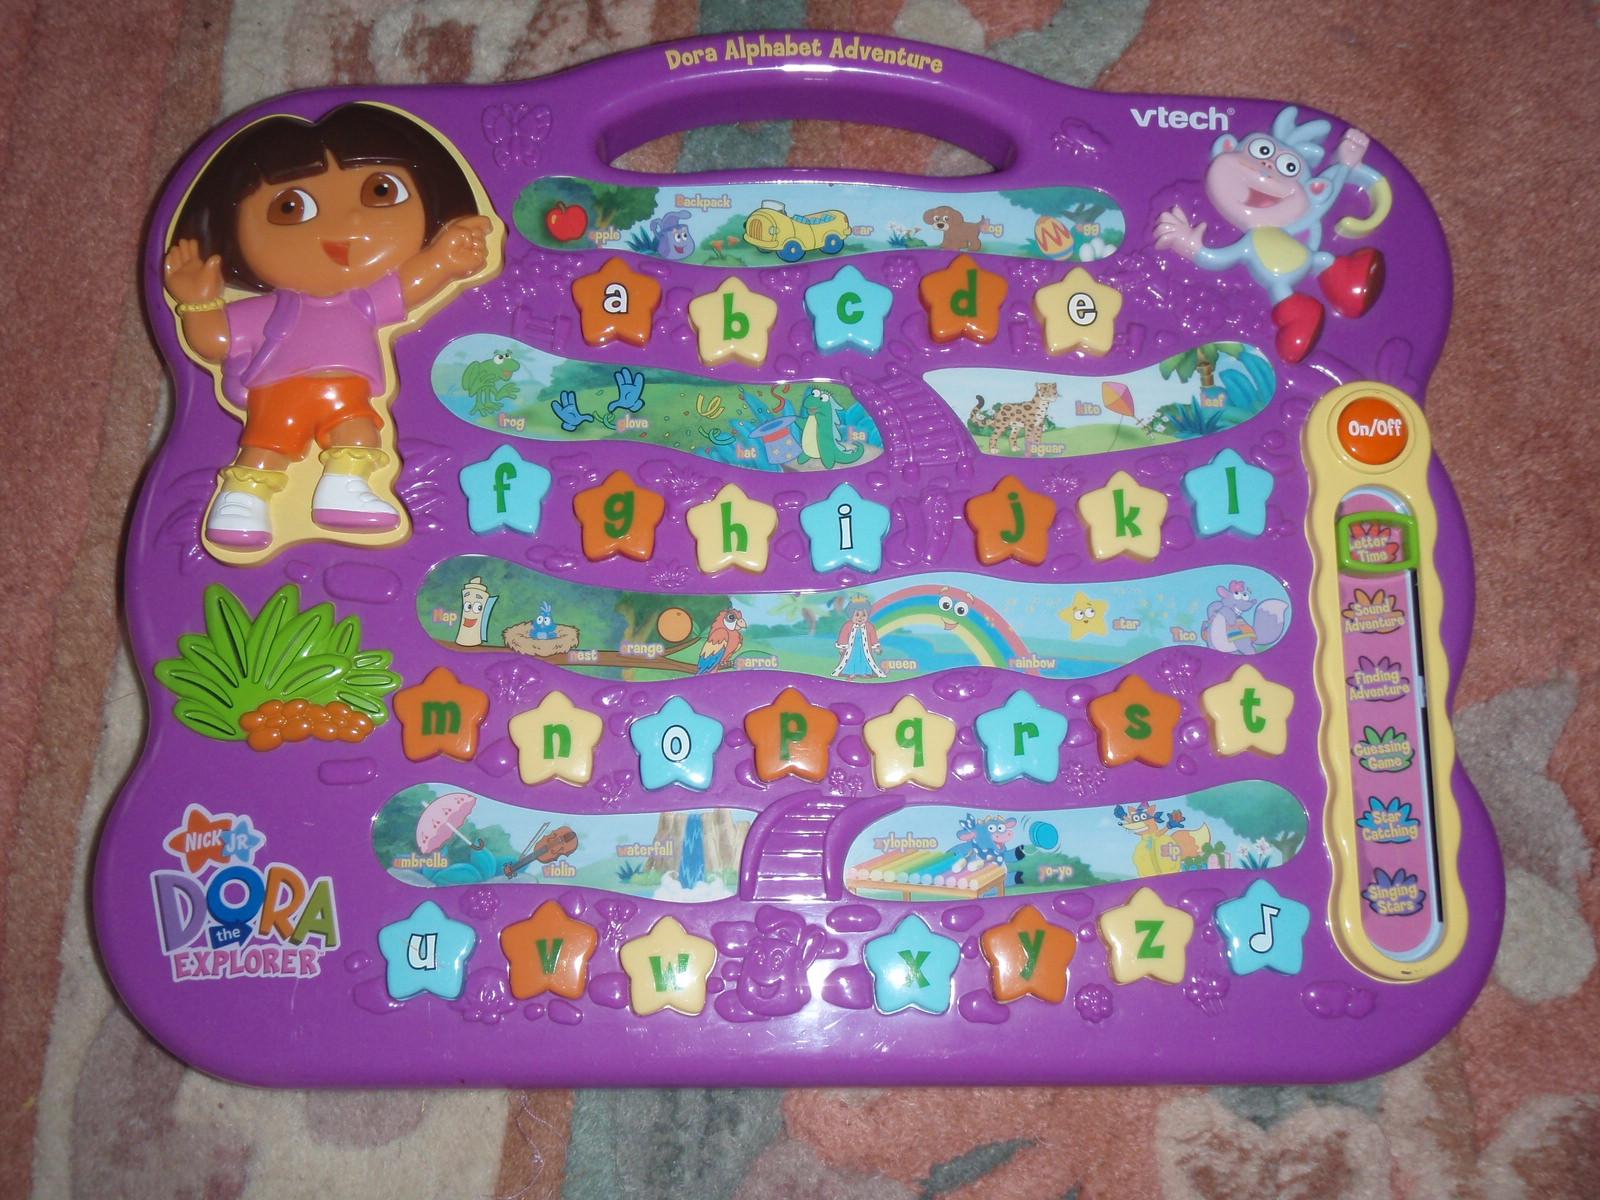 My Baby World Dora Alphabet Adventure By Vtech